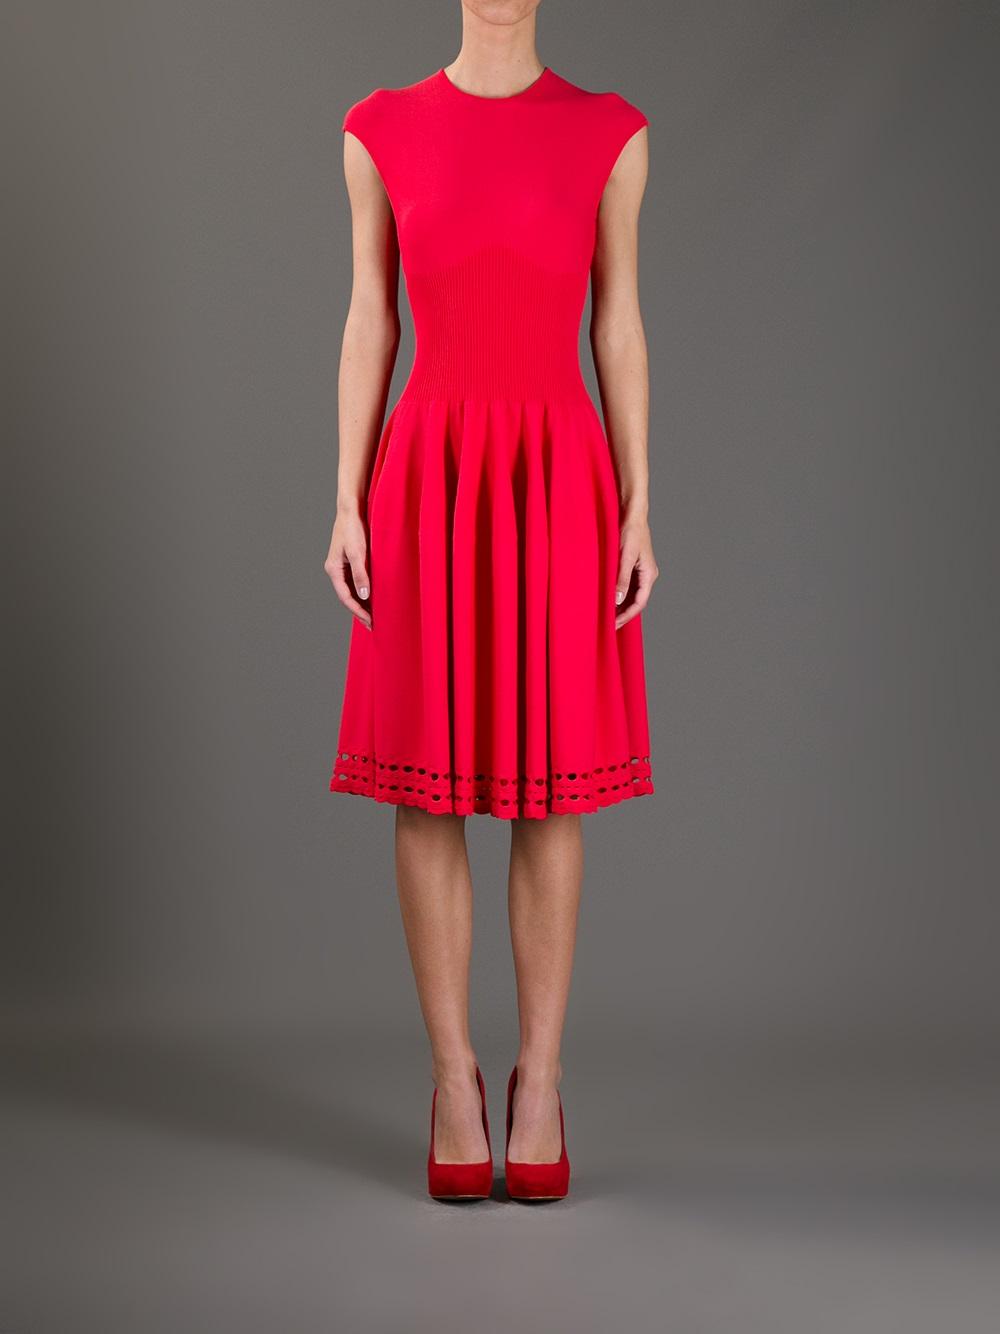 Lyst Alexander Mcqueen Pleated Dress In Red